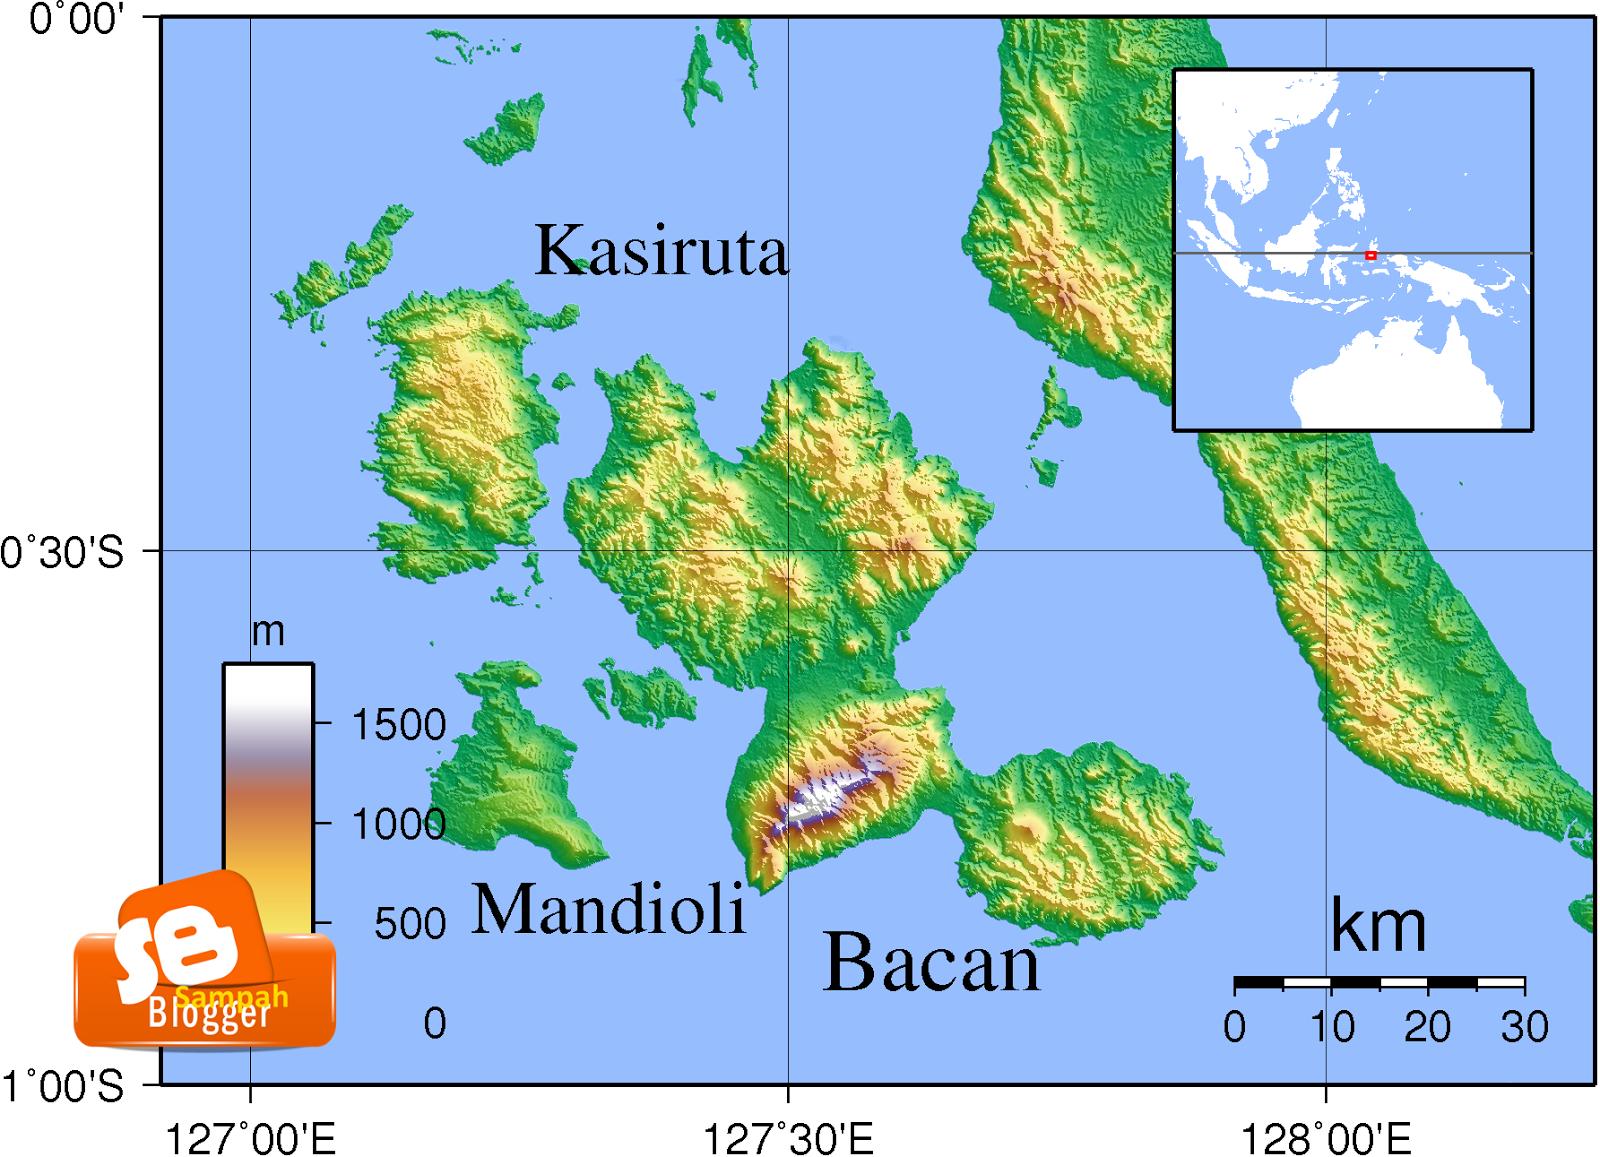 Mengenal Pulau Bacan Sebagai Sentra Batu Bacan di Indonesia